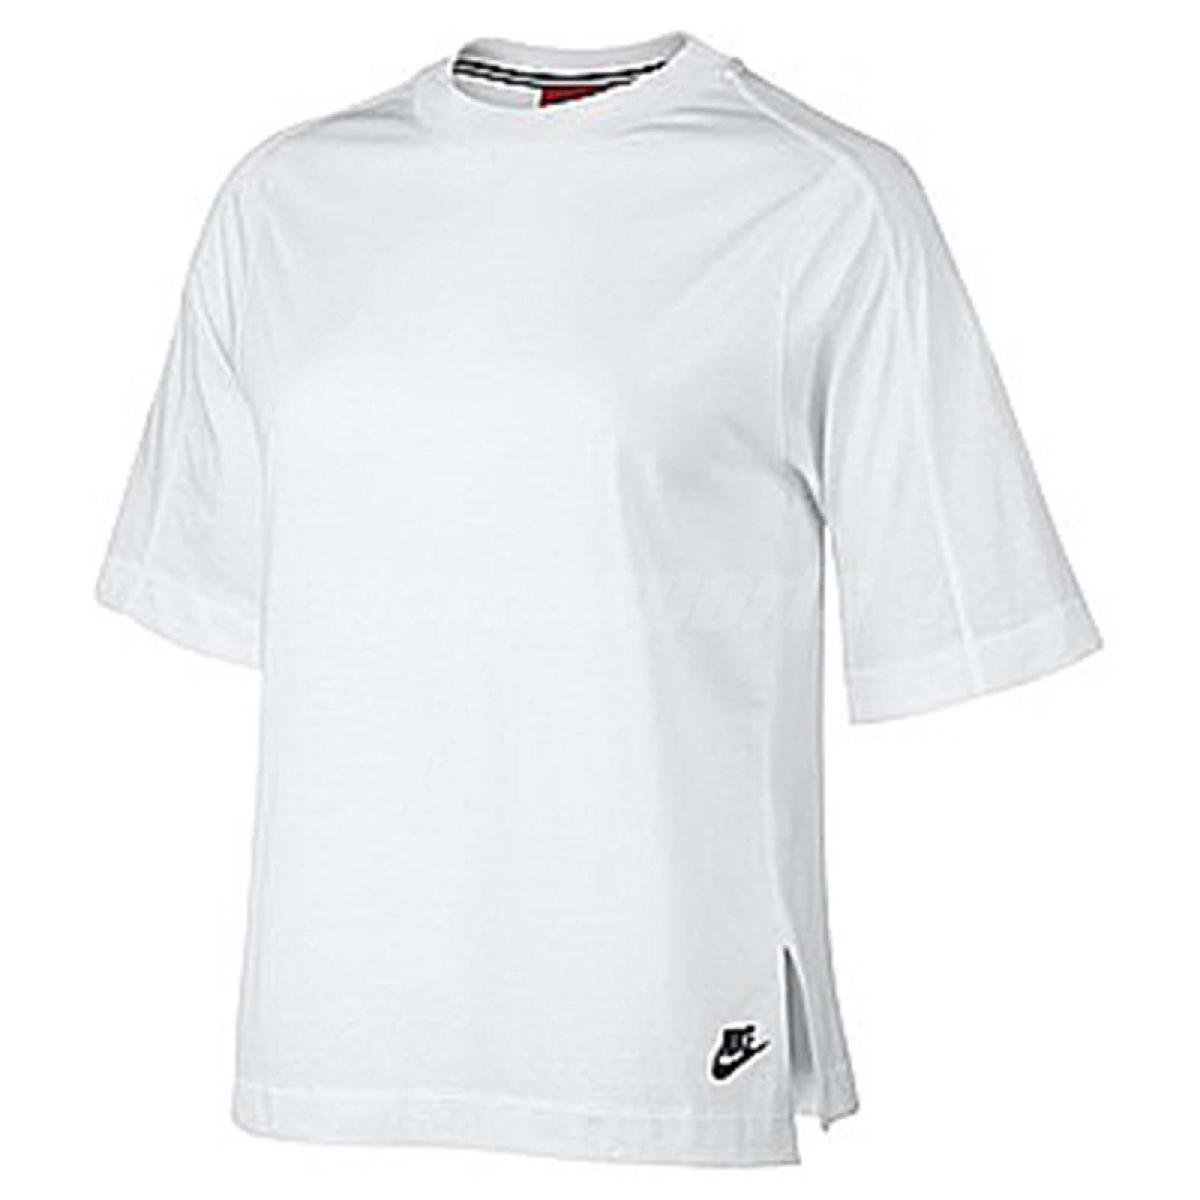 Nike T恤Wmns NSW Top Bonded白黑落肩寬版女款短袖上衣PUMP306 804036-100